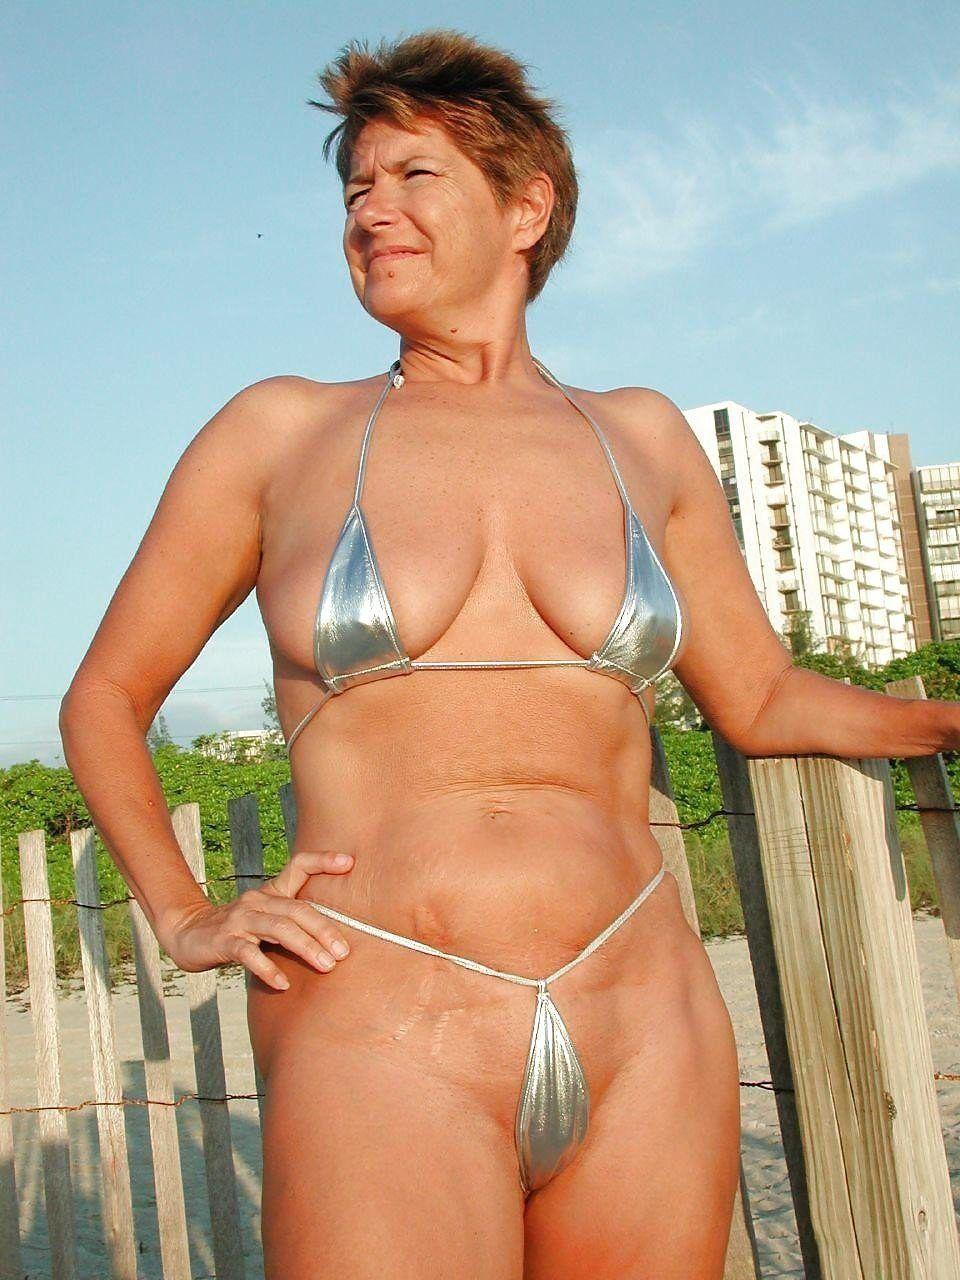 Mature naked bikinis porn pics and movies